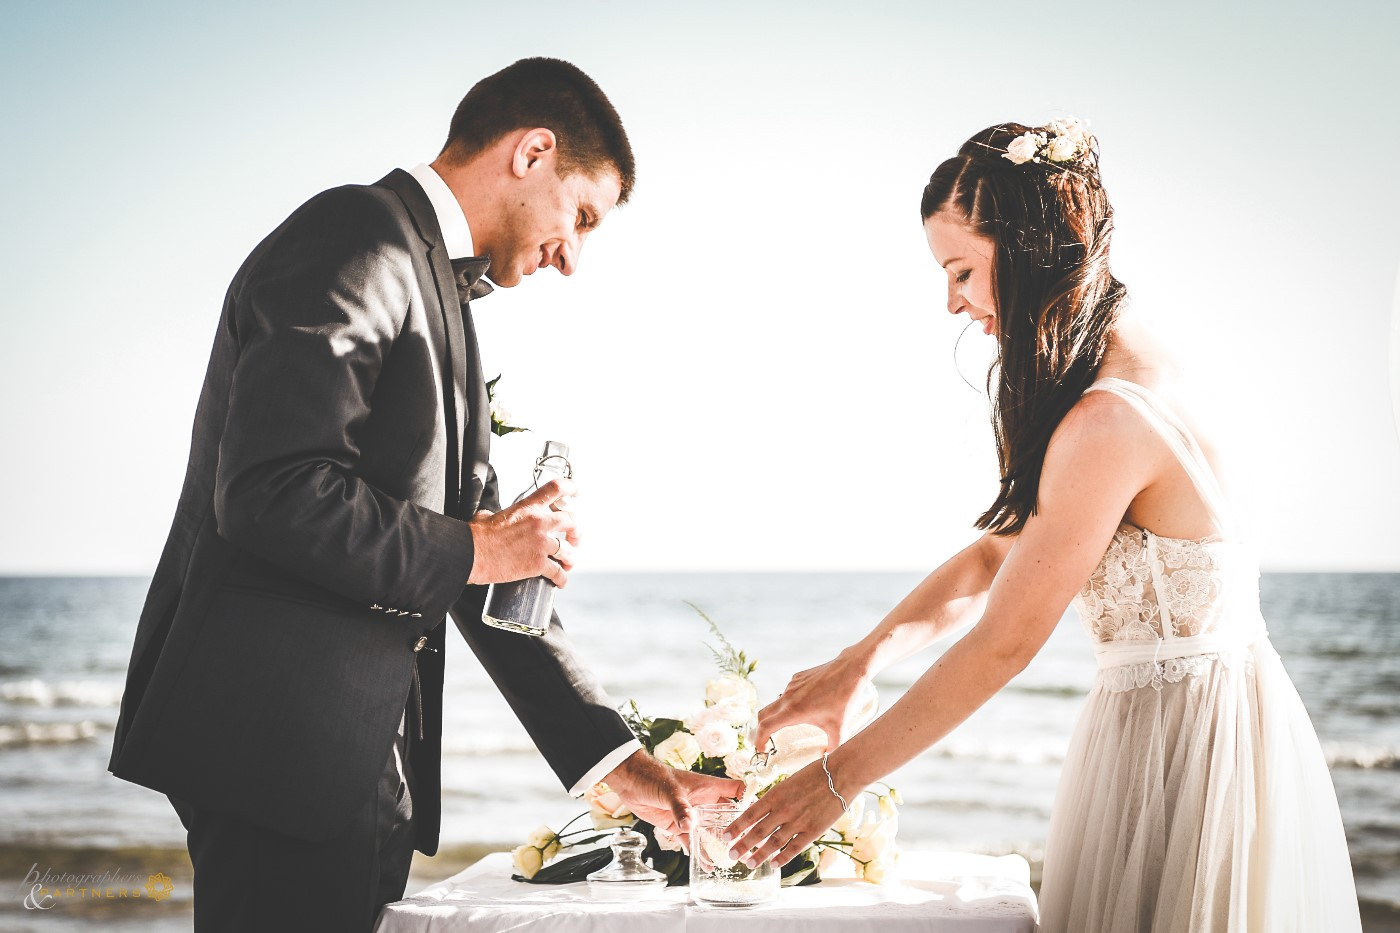 photographer_weddings_grosseto_12.jpg